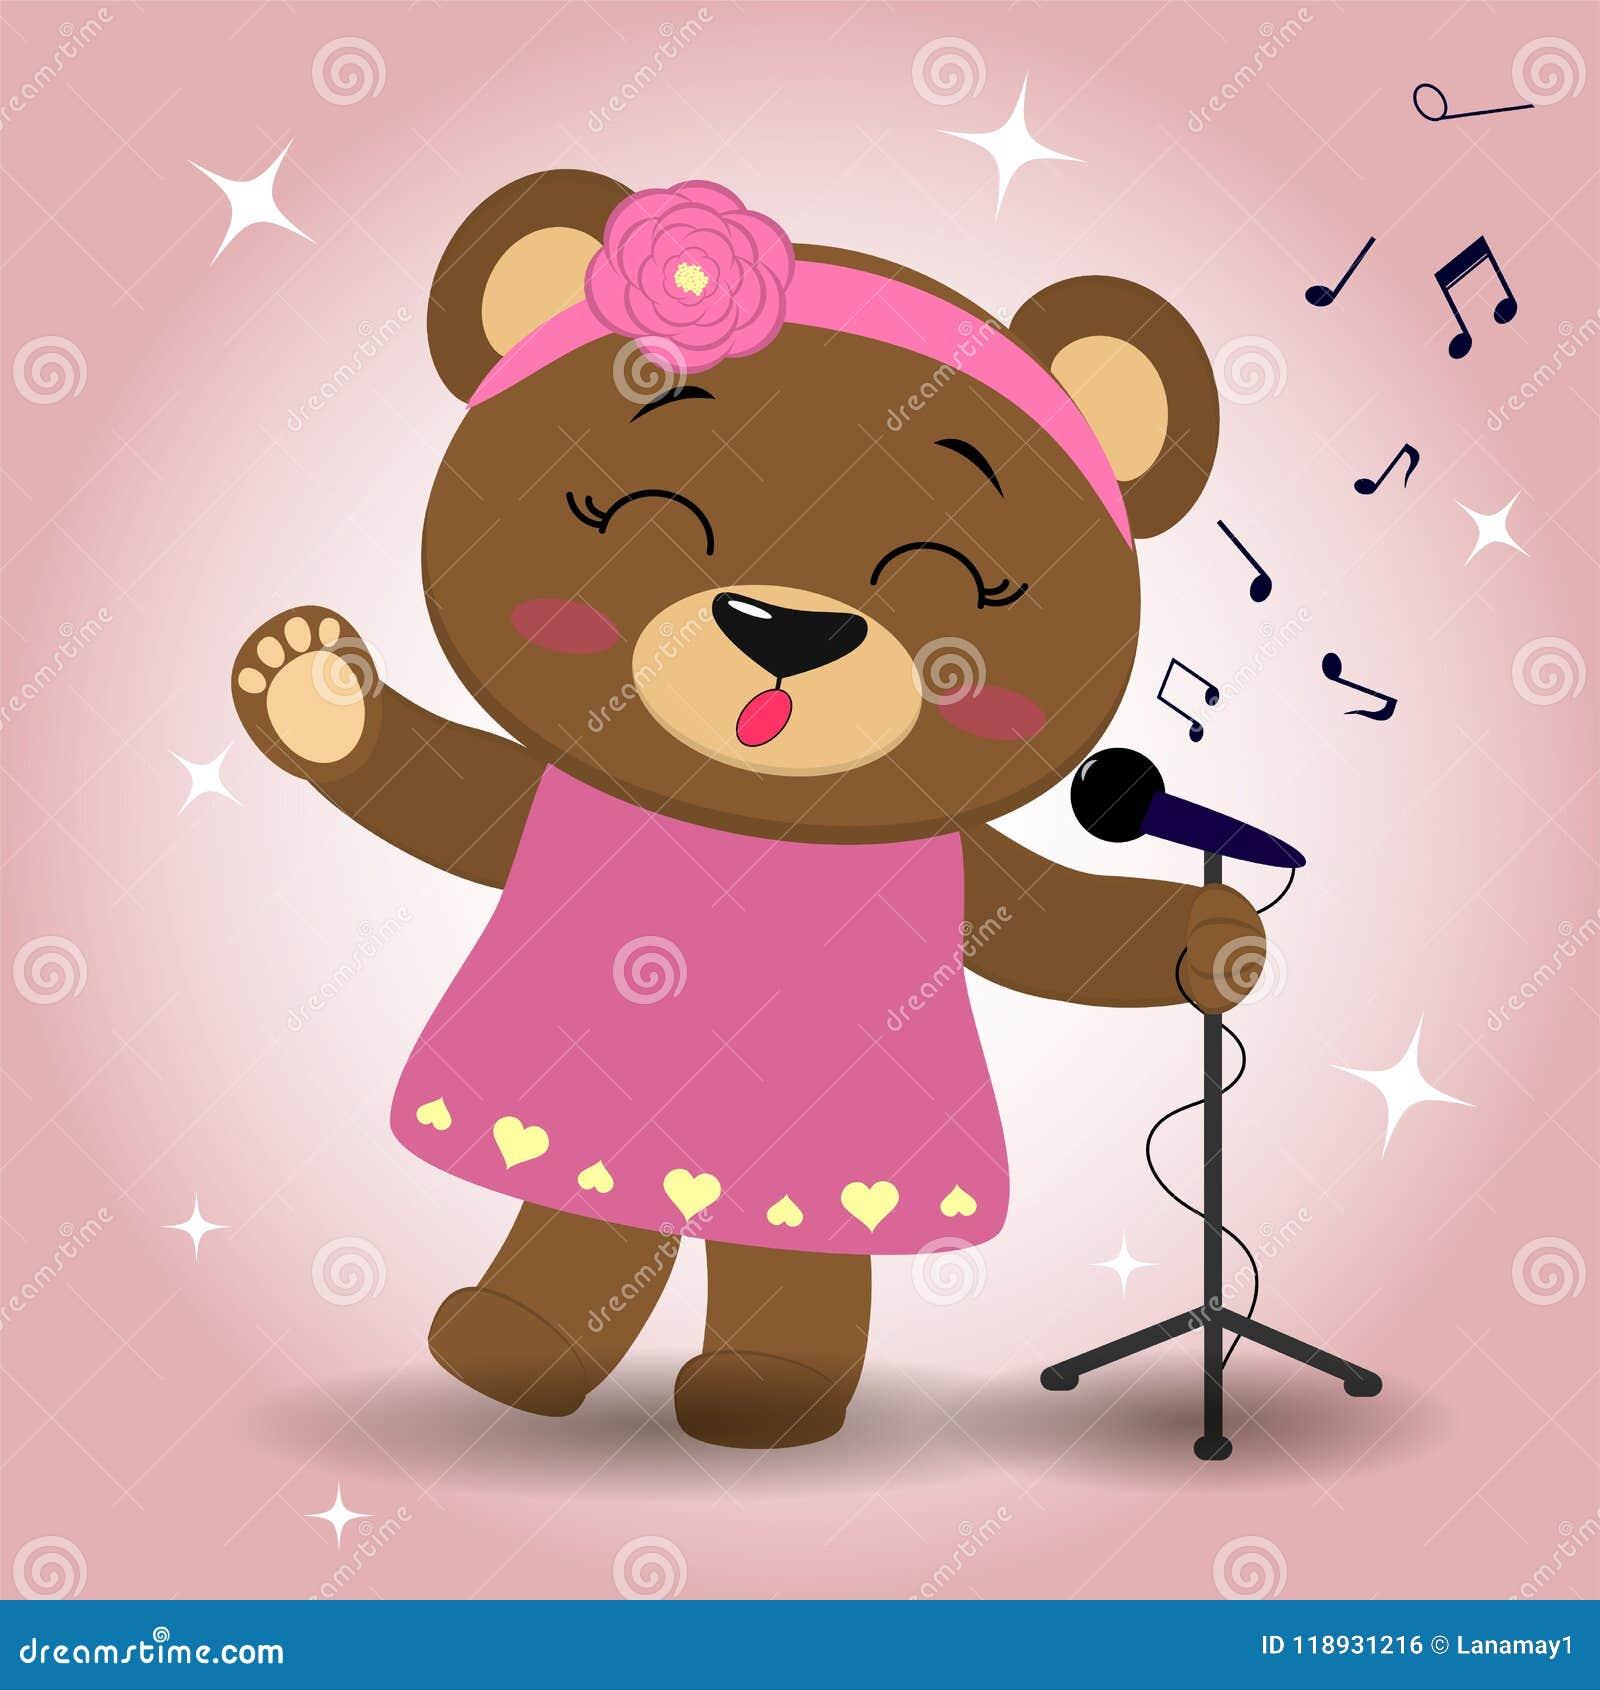 163a8ee01 Bear Microphone Stock Illustrations – 178 Bear Microphone Stock  Illustrations, Vectors & Clipart - Dreamstime